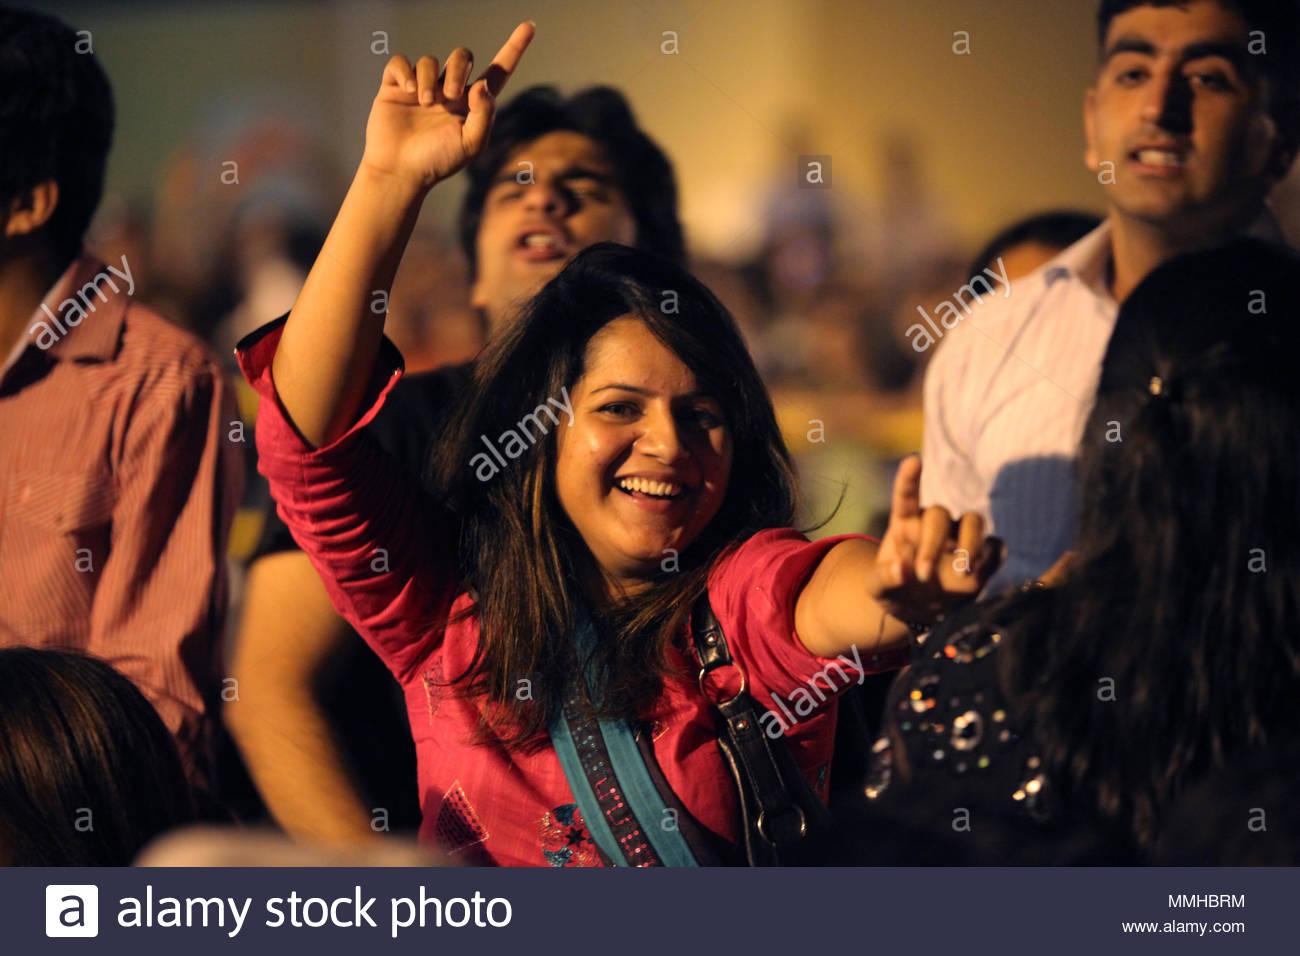 Mtv Asian Woman Stockfotos & Mtv Asian Woman Bilder - Alamy